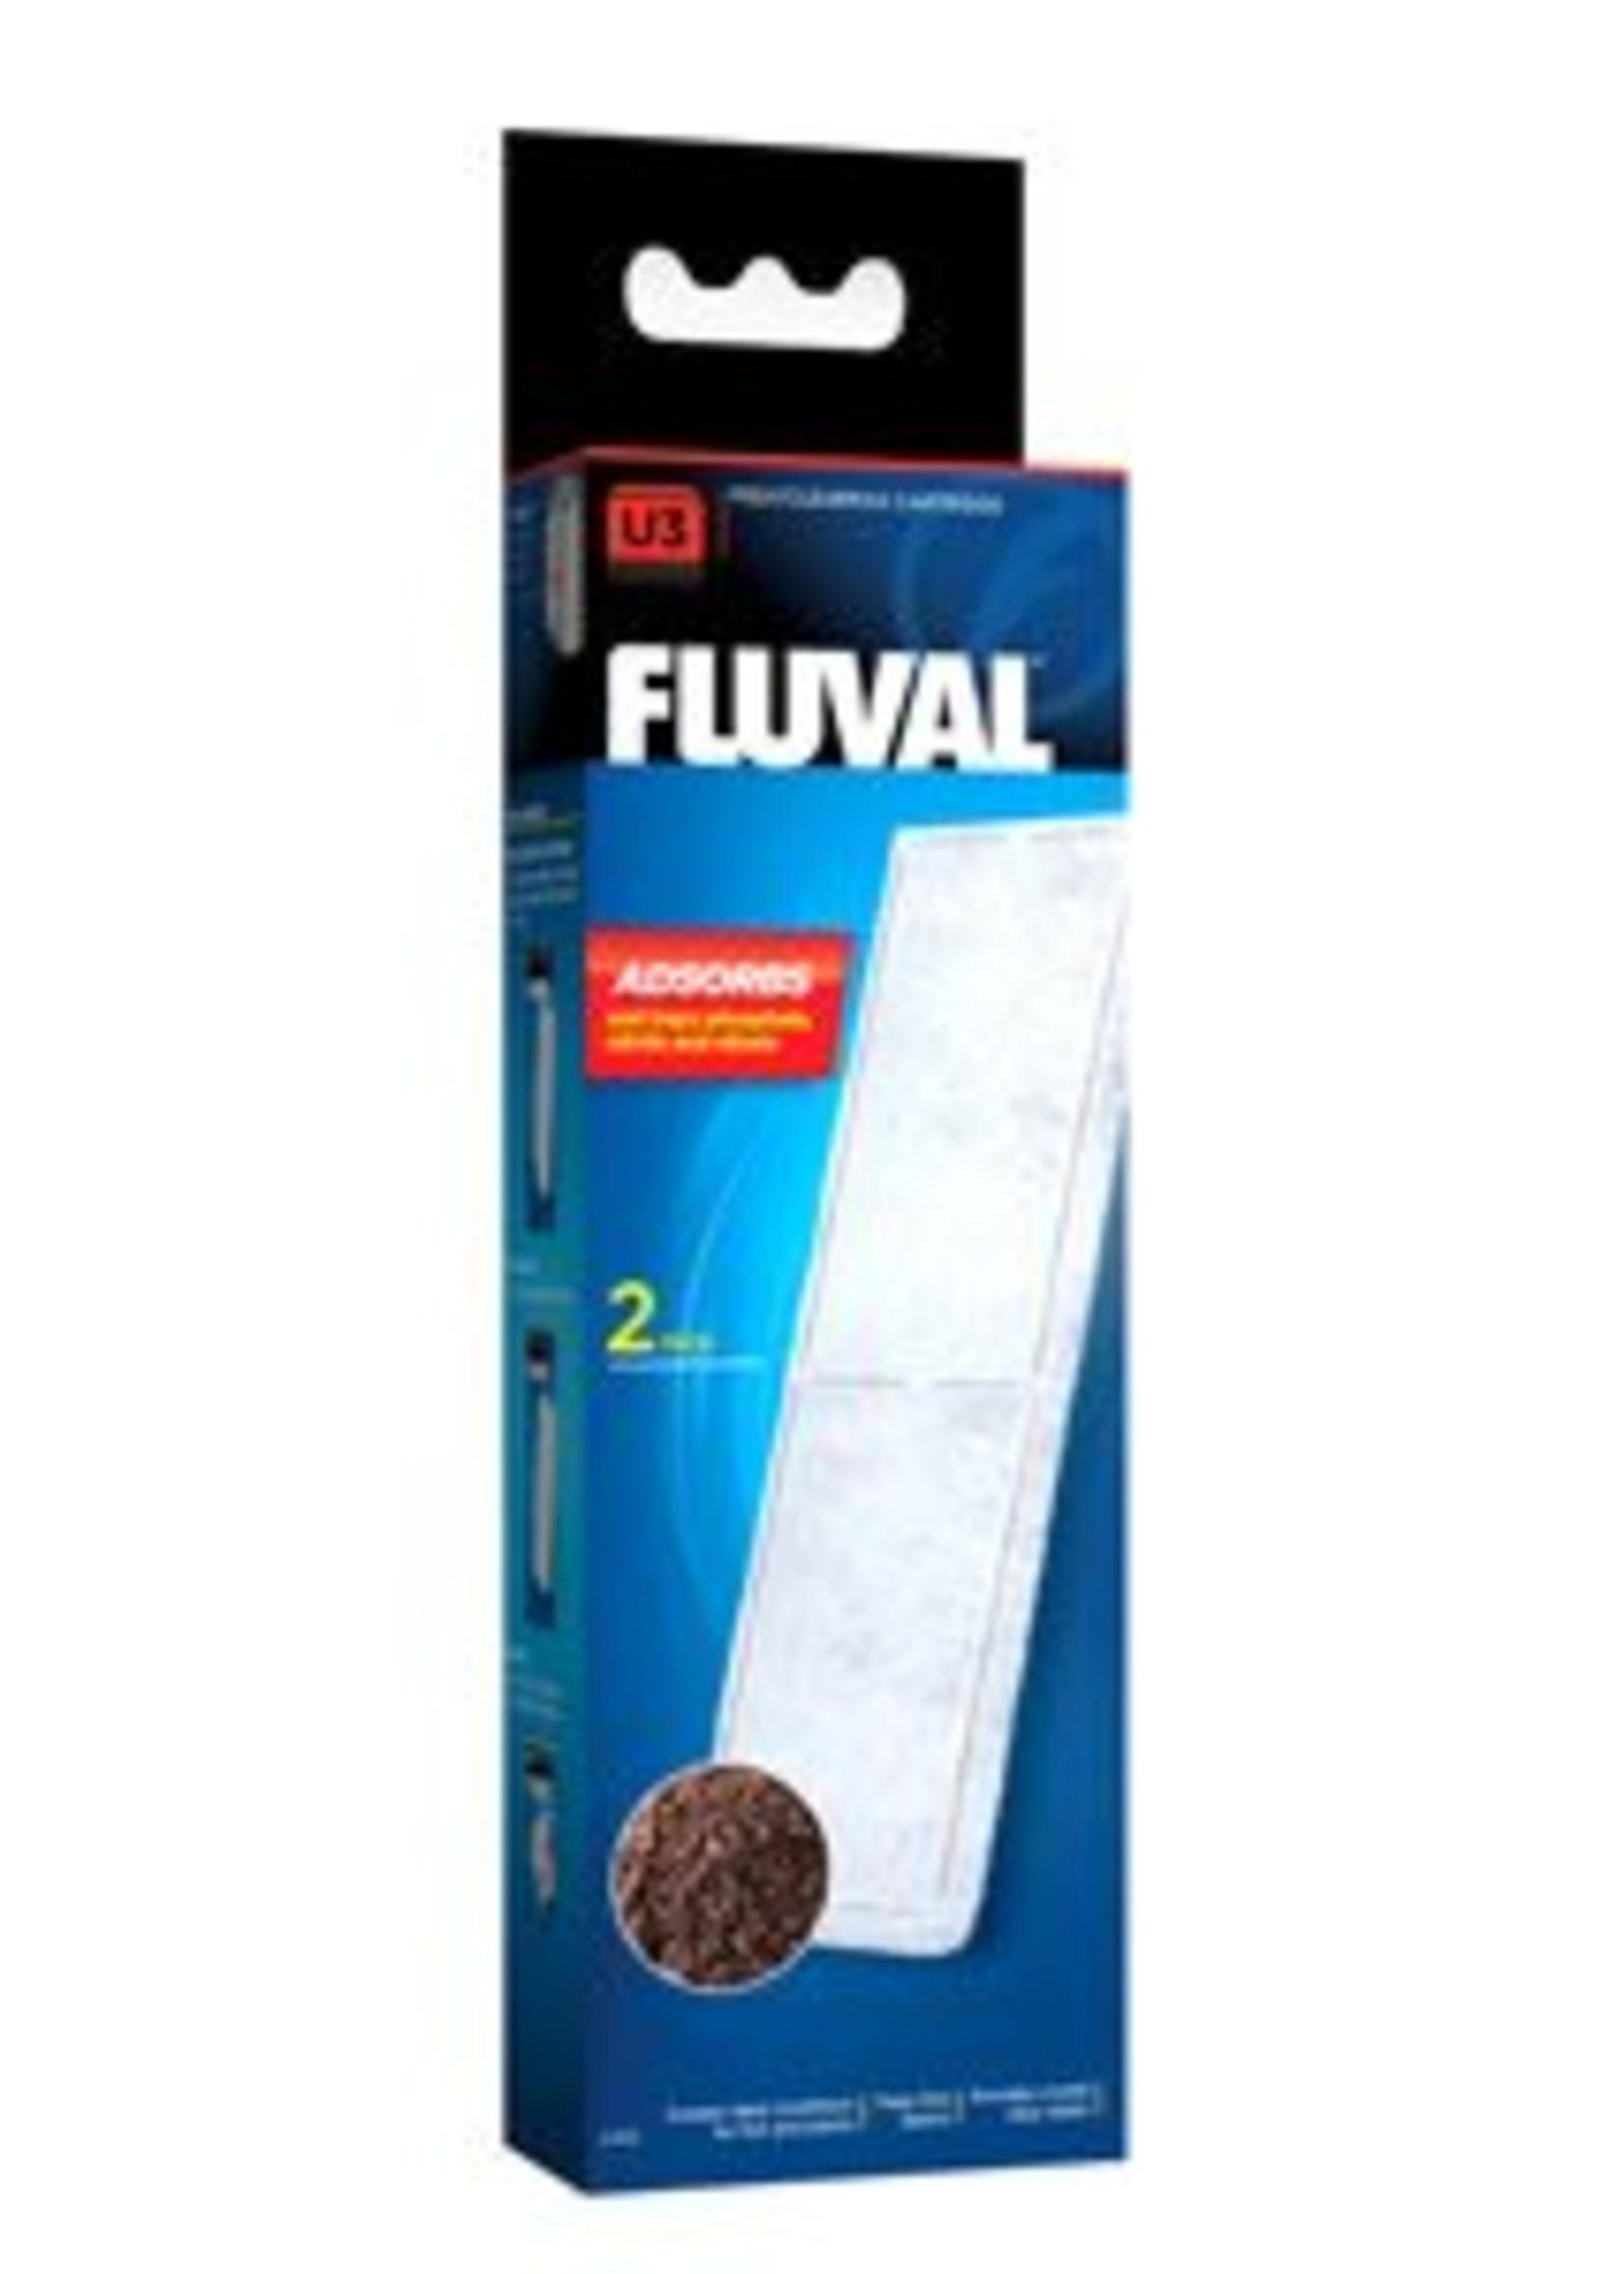 Fluval Fluval U3 Clearmax Cartridge, 2-pack